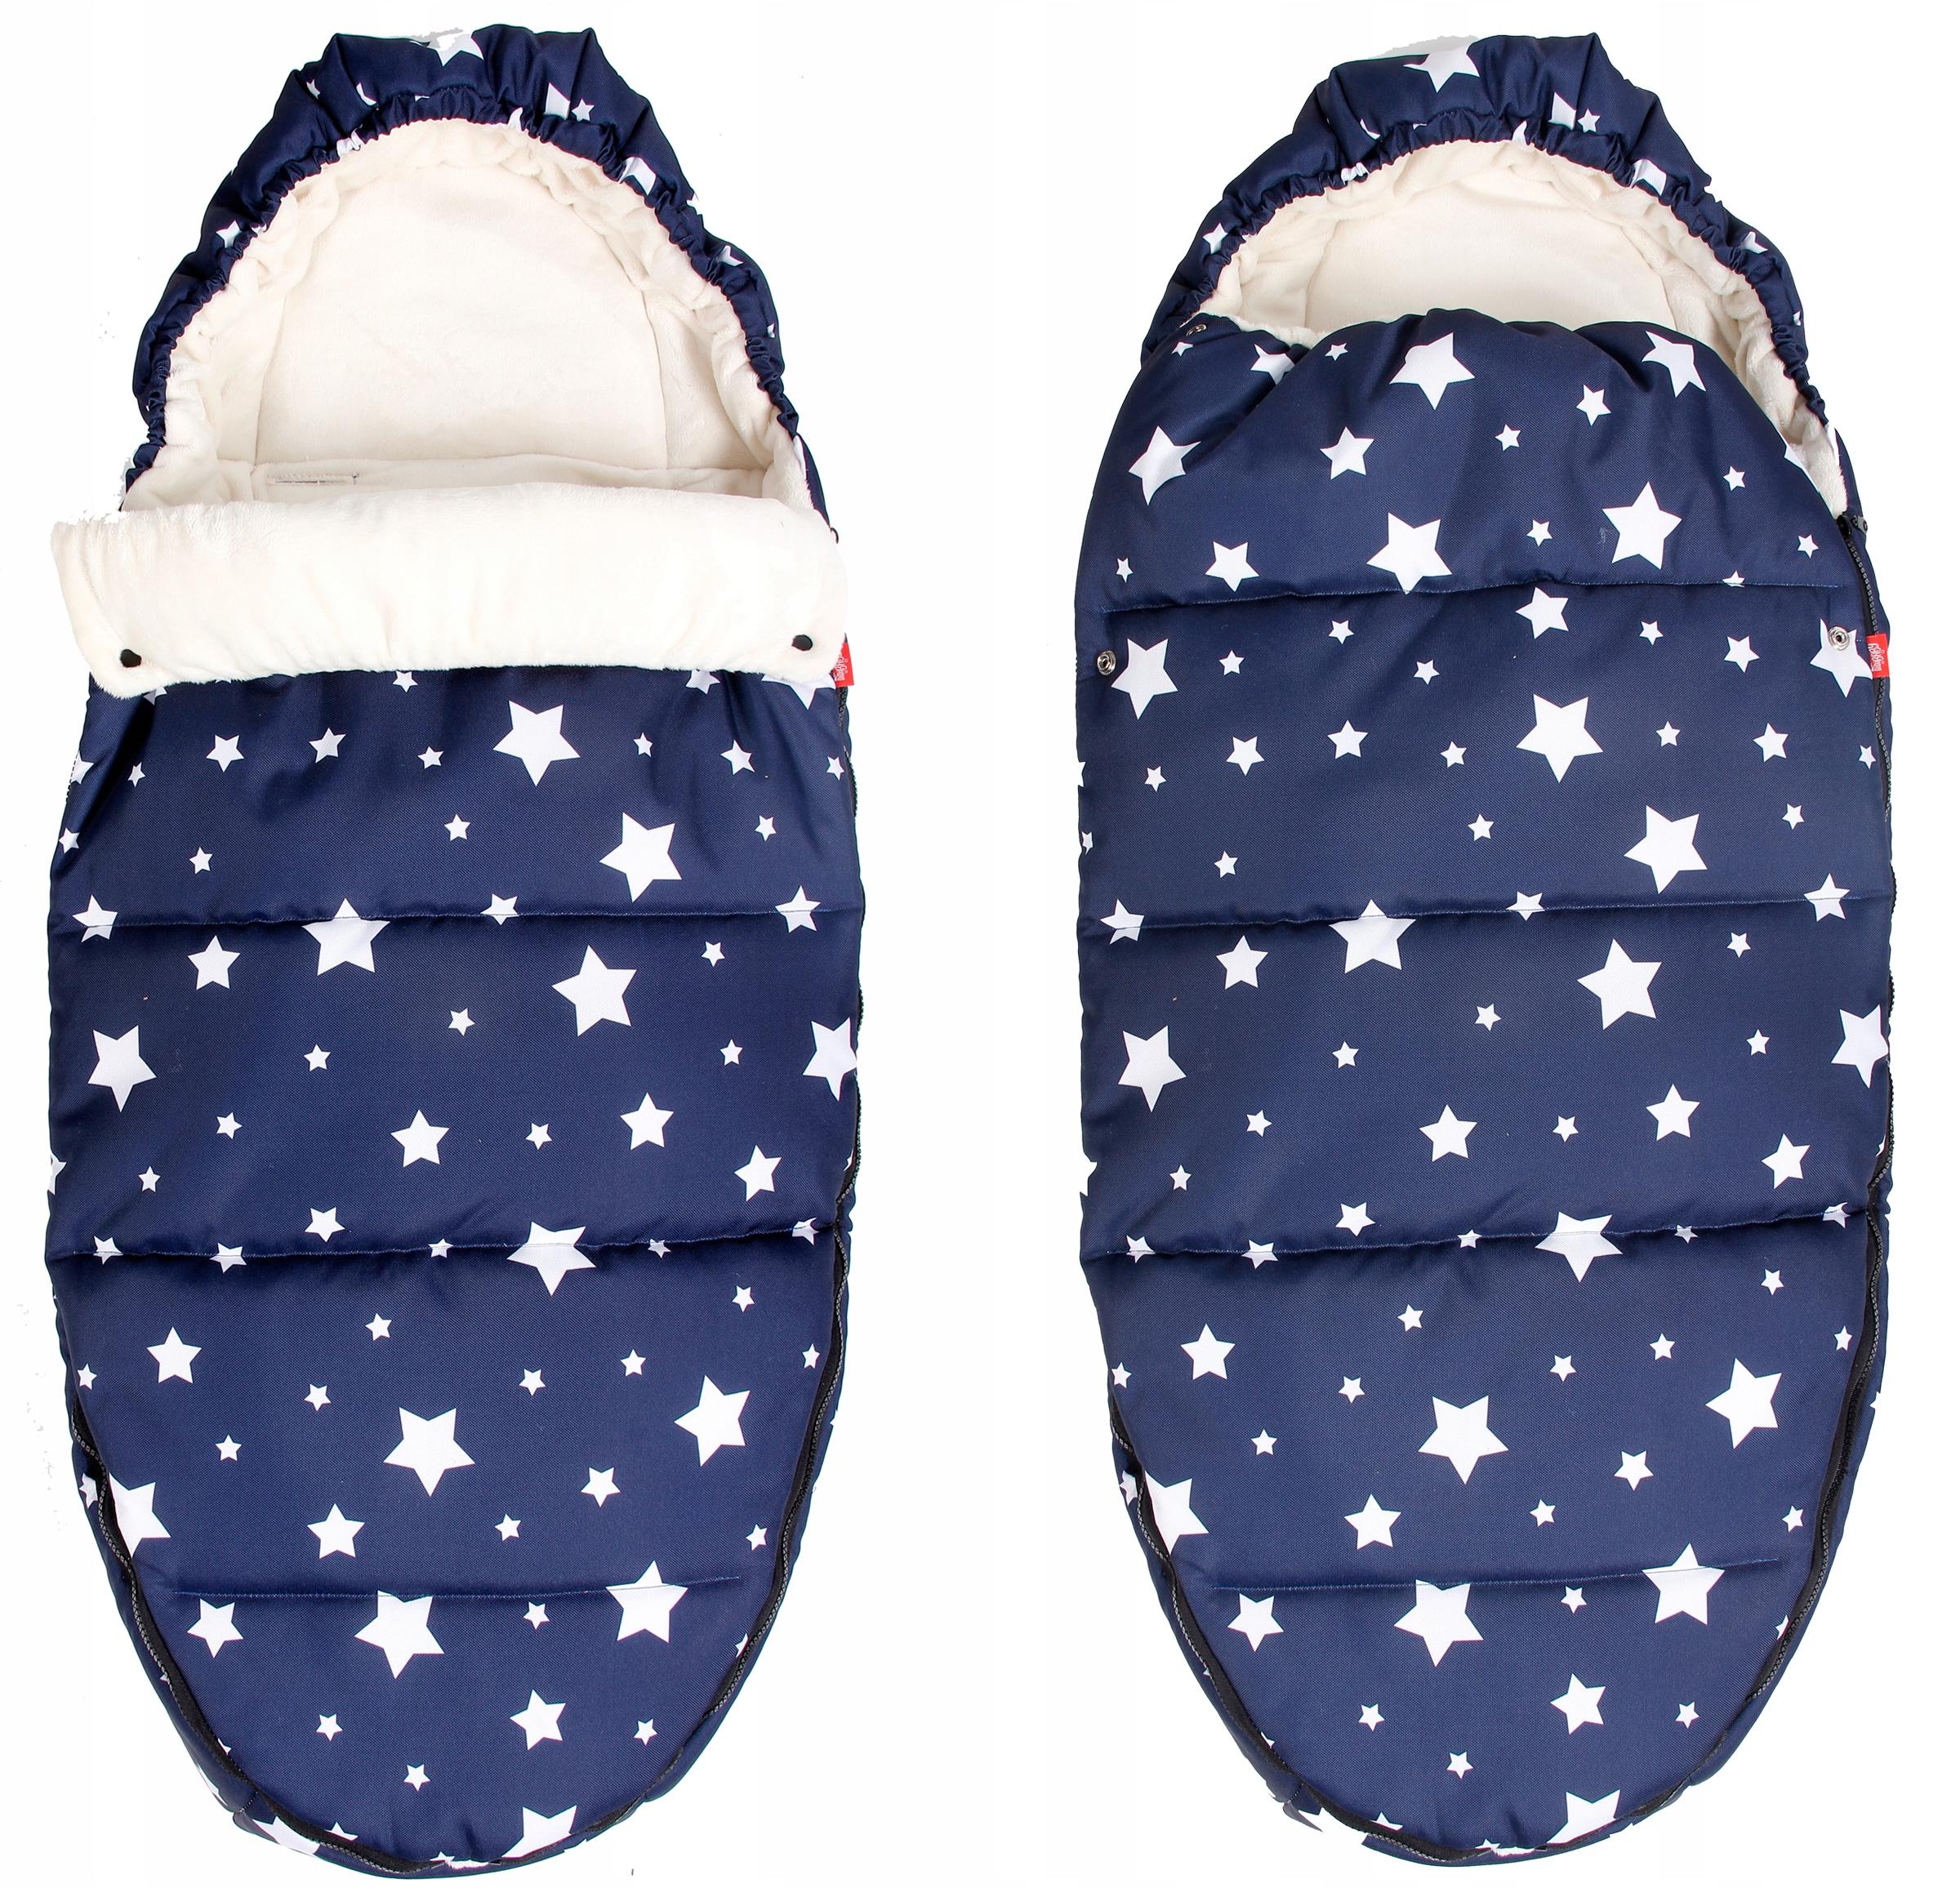 4 IN1 WARM MINKY SLEEPING BAG 105 CM DESIGNS 2018/19